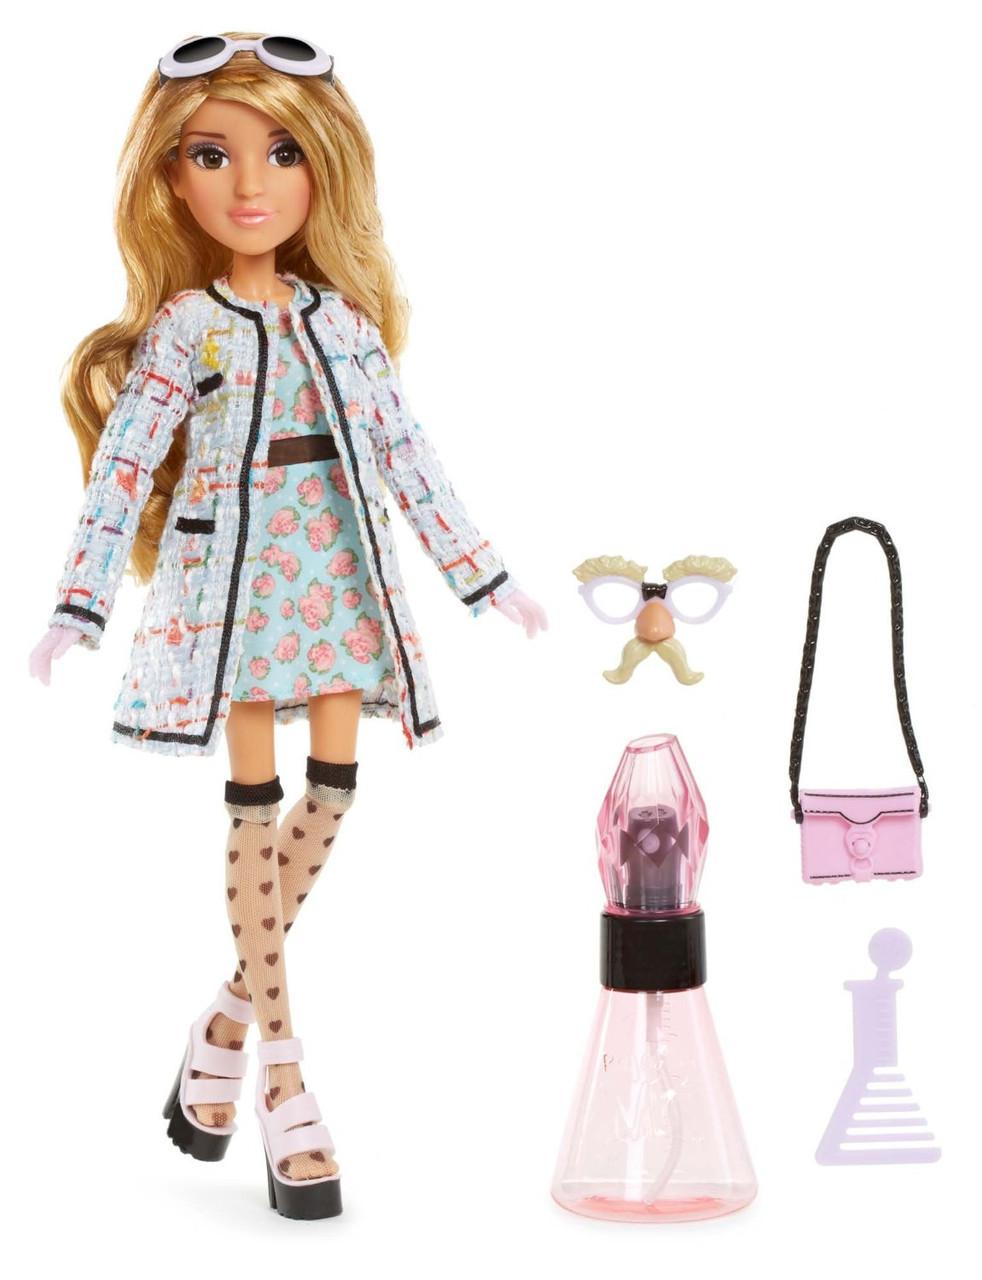 "Лялька Адрієнн з эксперементом ""Духи"" - Project Mc2 Doll with Experiment - Adrienne's Perfume"